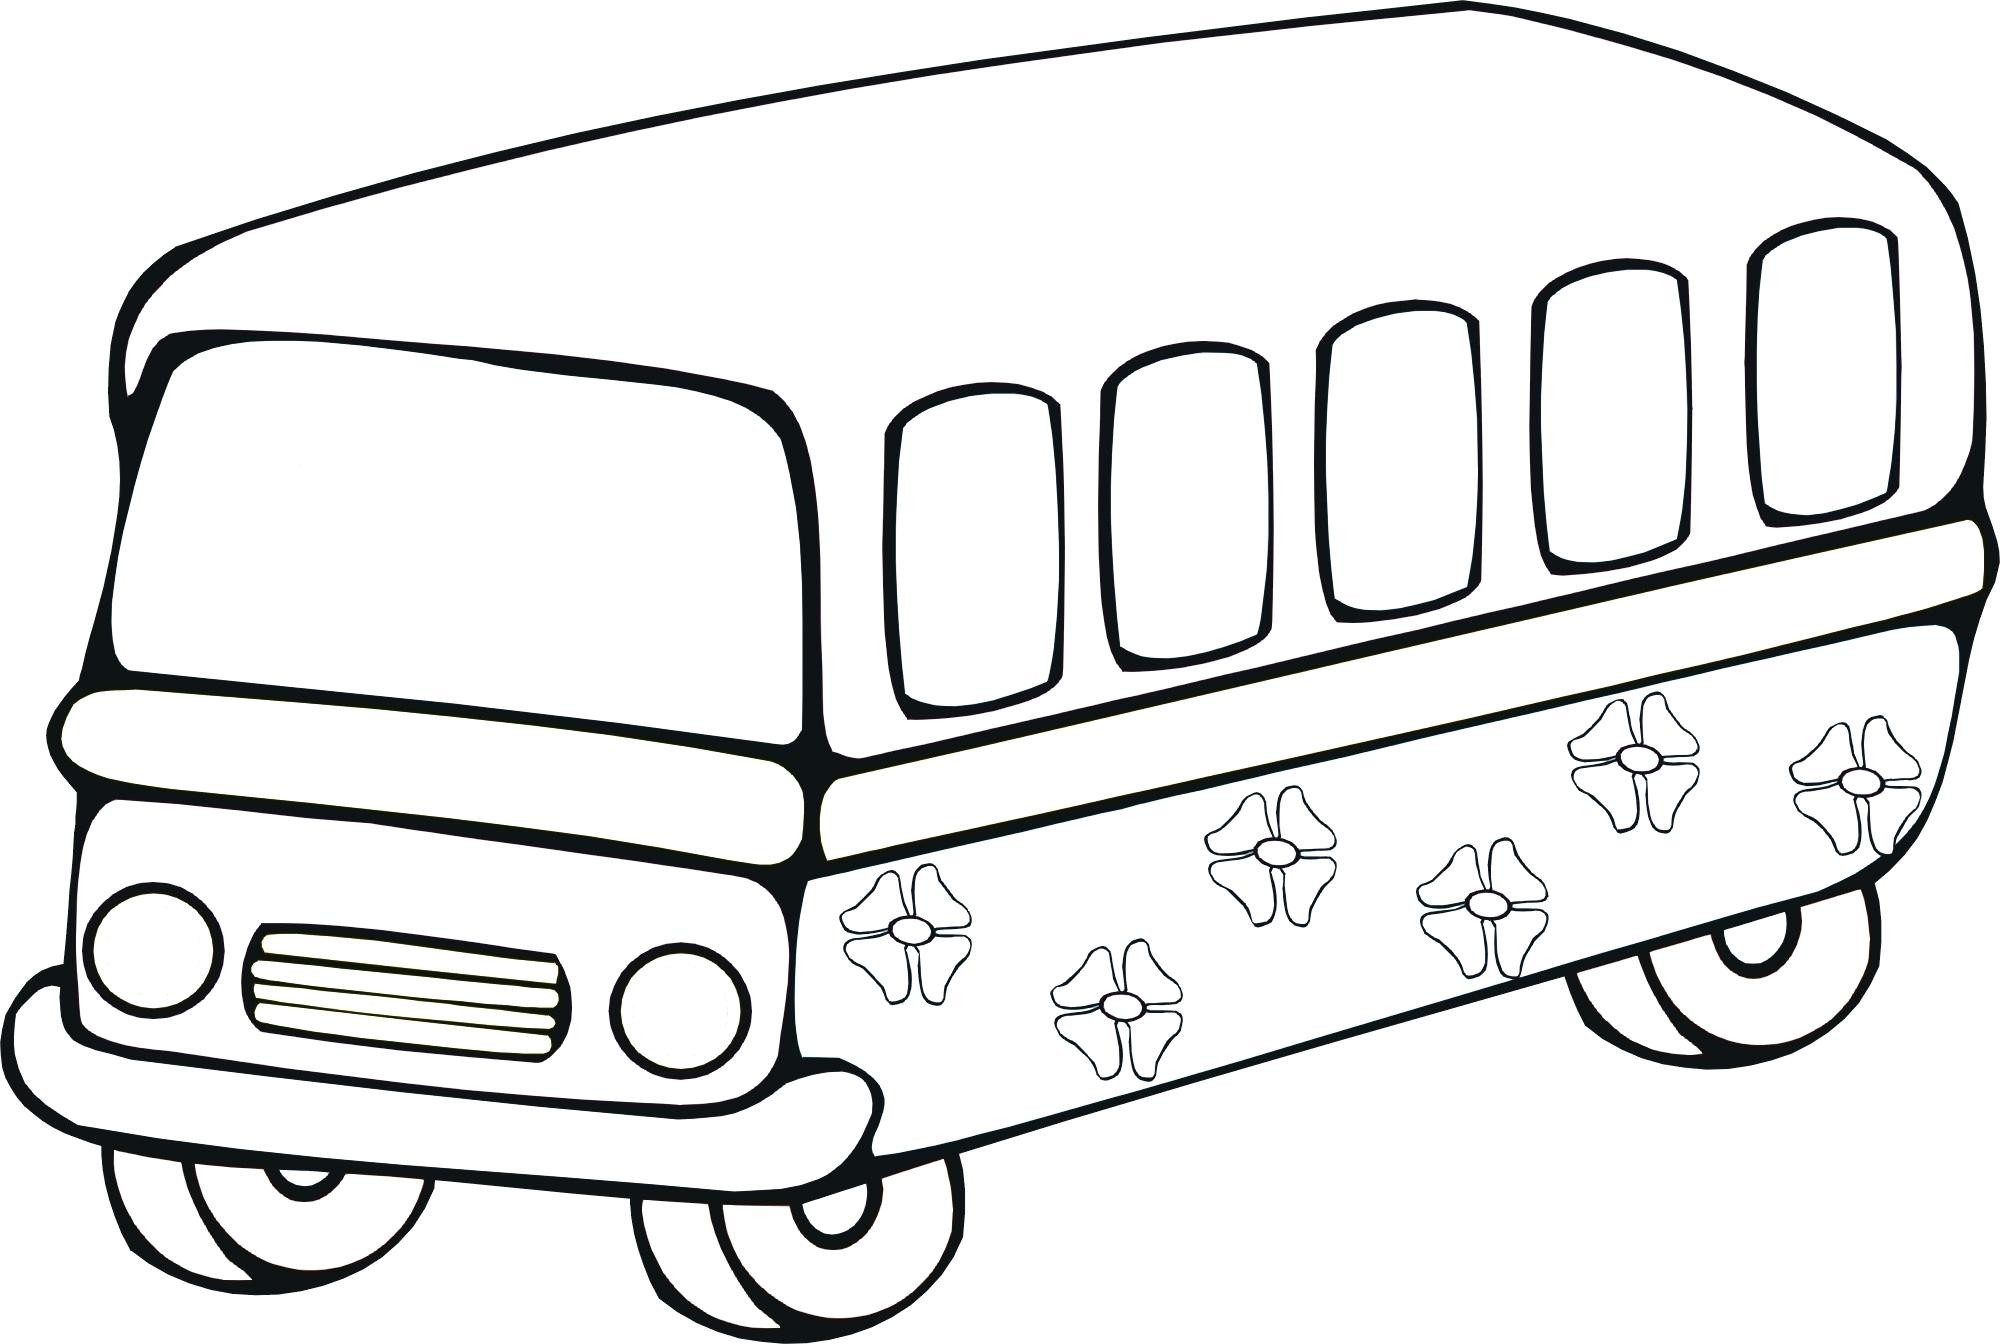 toy car drawing at getdrawings com